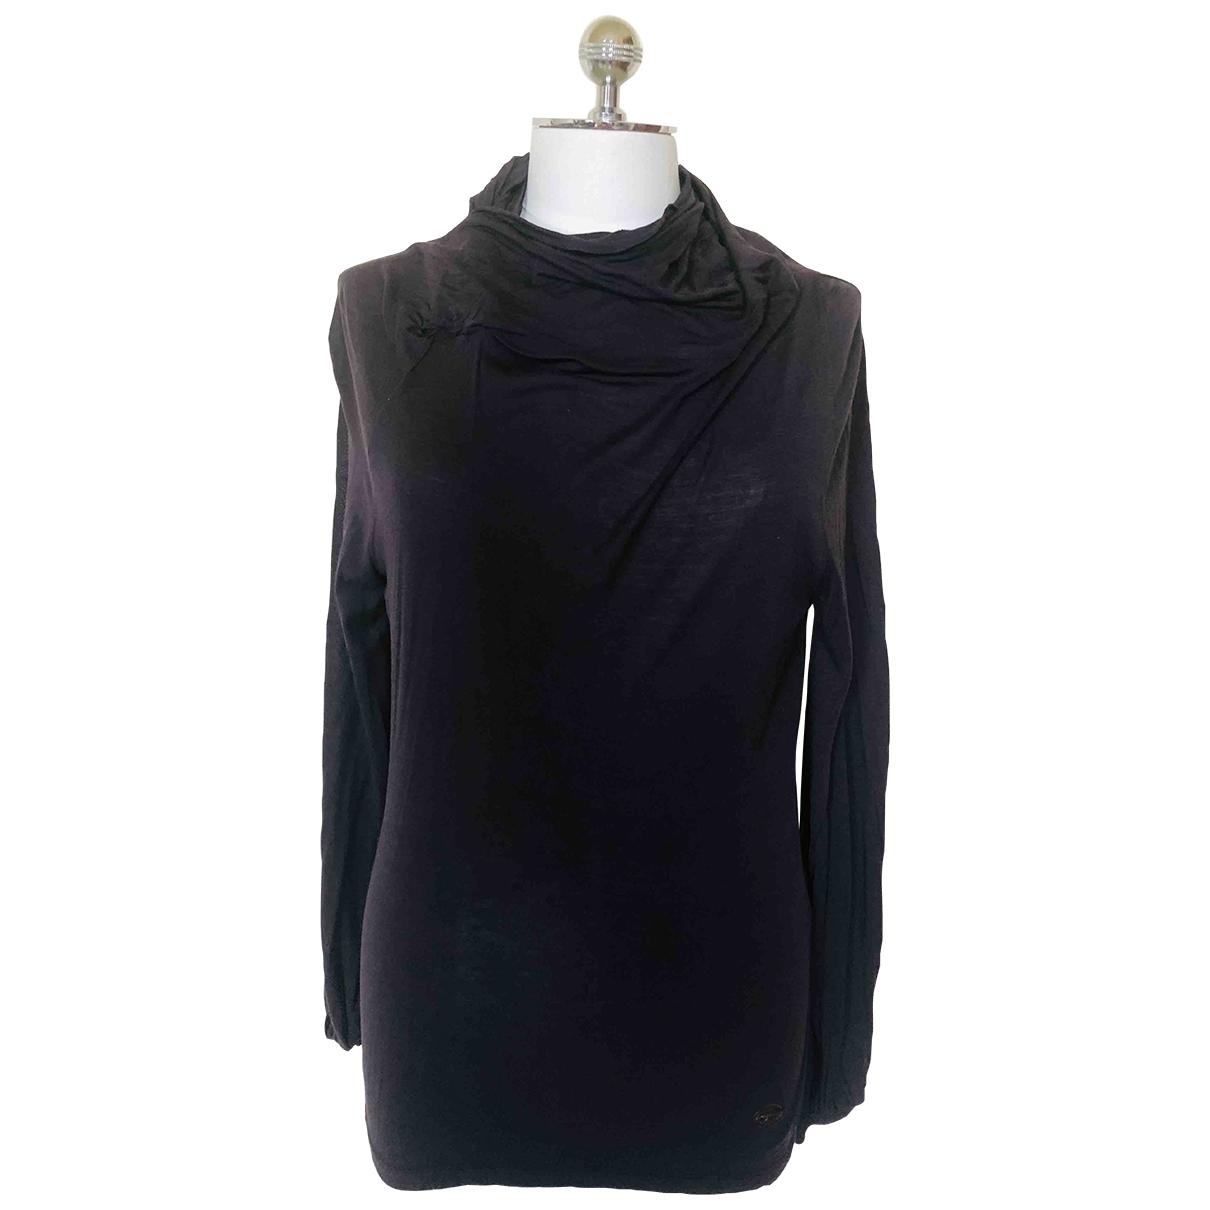 Salvatore Ferragamo \N Purple Cotton  top for Women 40 IT